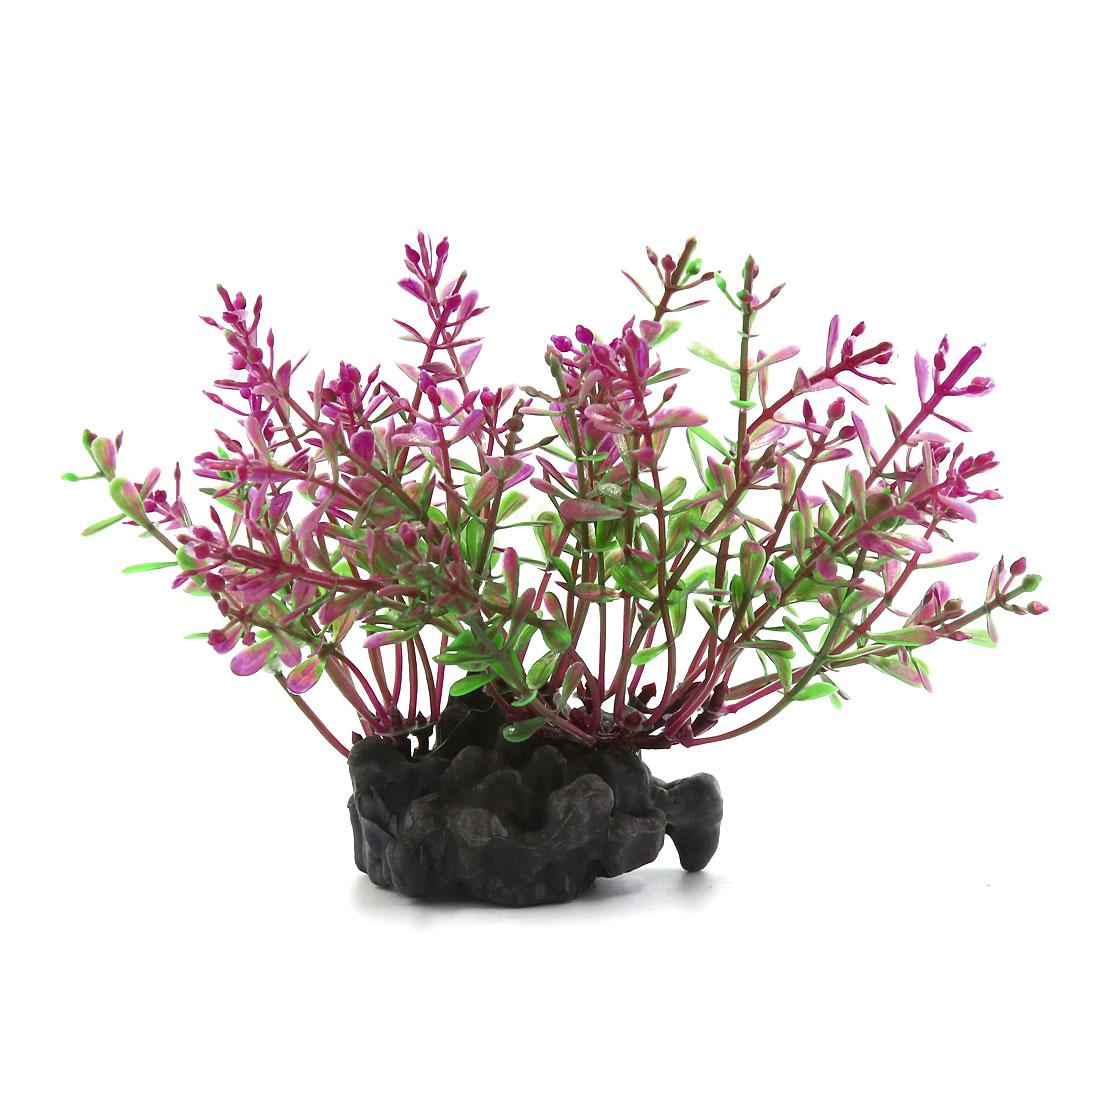 Aquarium Artificial Purple Leaves Plants Ornament For Fish Tank 10x3x11cm